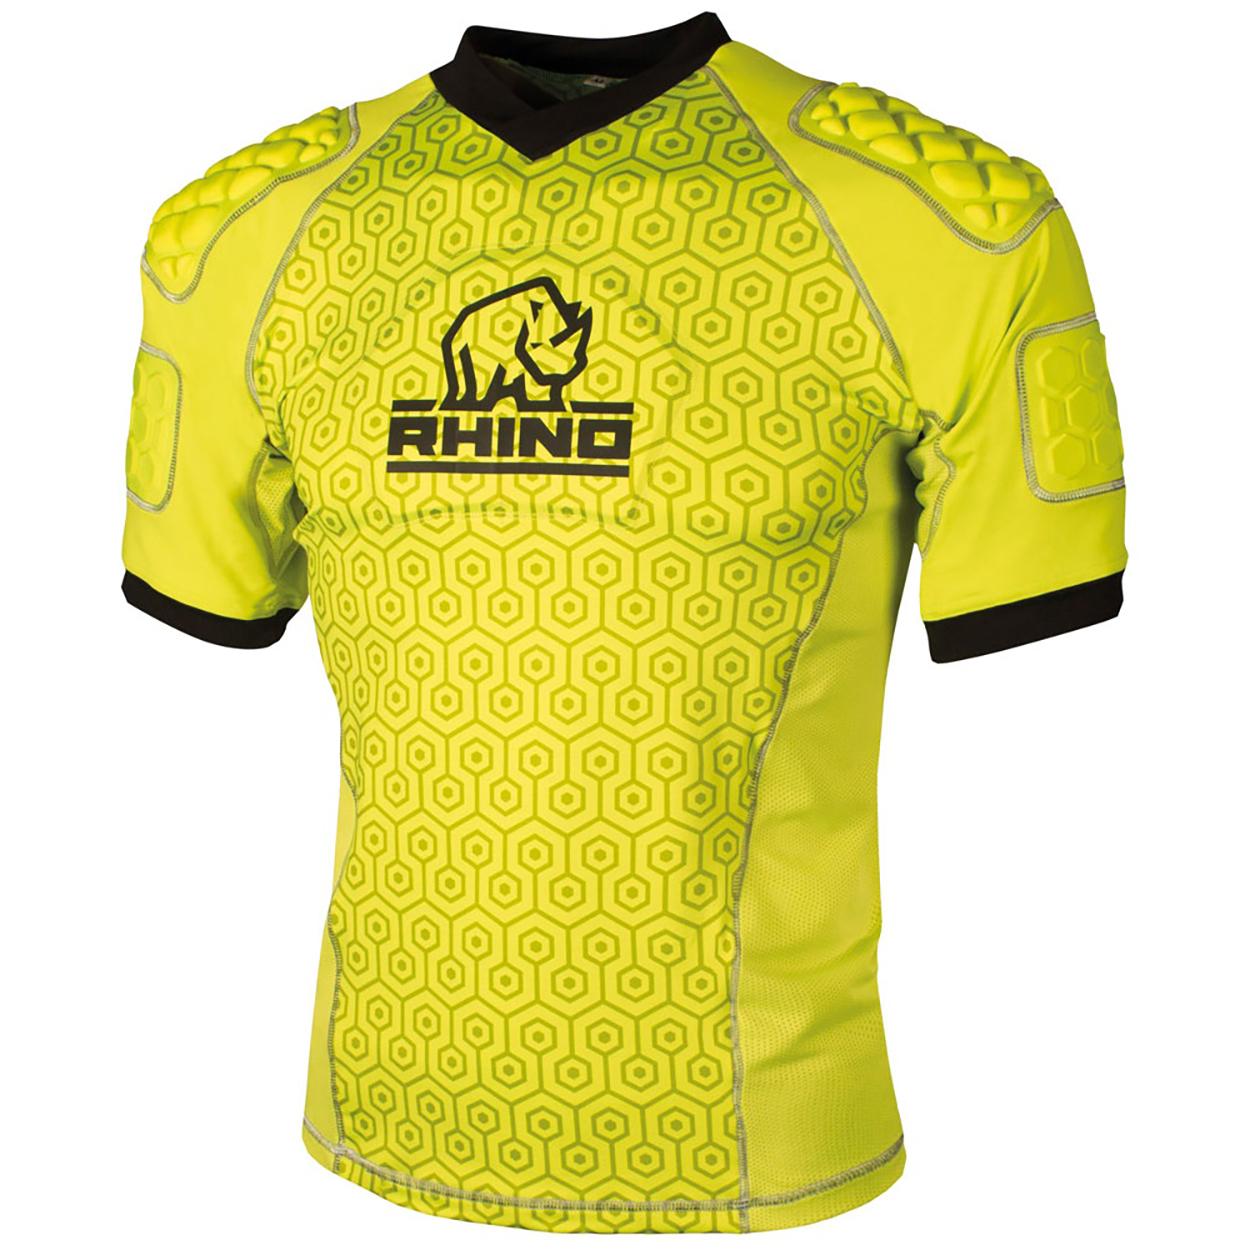 Rhino Unisex Adult Pro Body Protection Top (S) (Black)